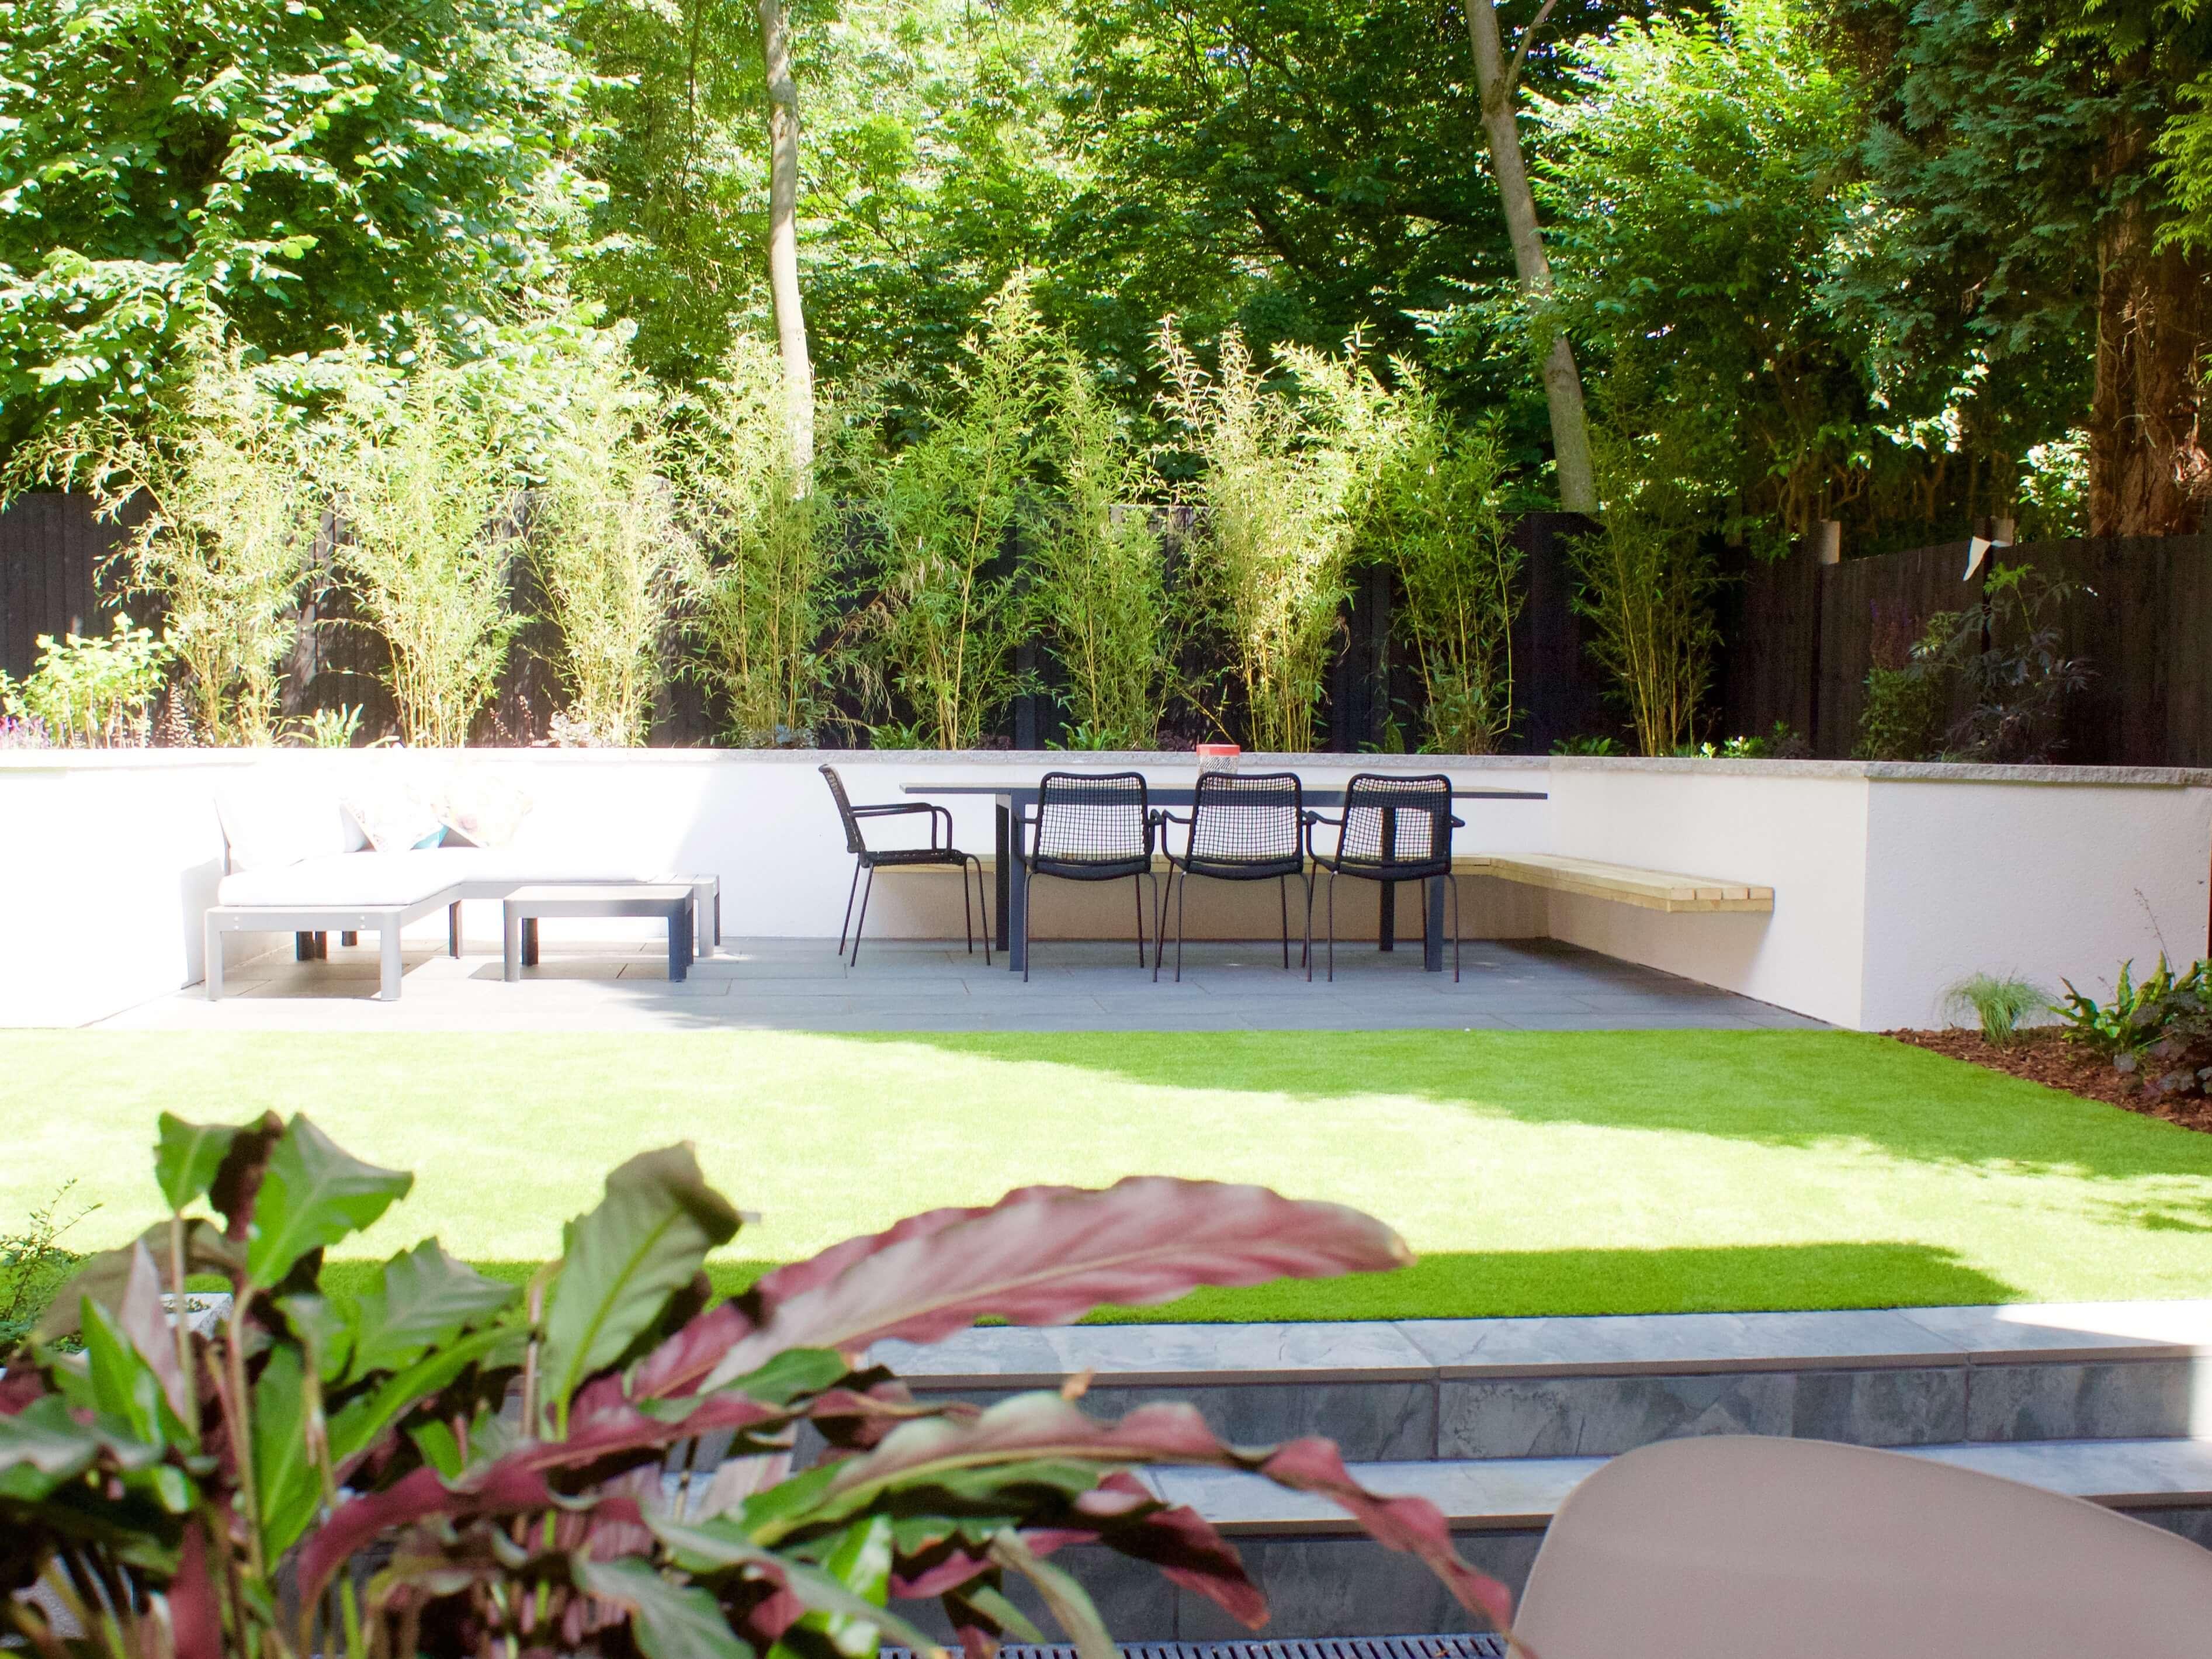 Outdoor Living & Garden Design In Staffordshire, Cheshire, Manchester, Bowdon, Altrincham, Hale, Sale, Lymm, Knutsford, Wilmslow, Macclesfield, Alderney Edge, Eccles, Didsbury, Chorlton